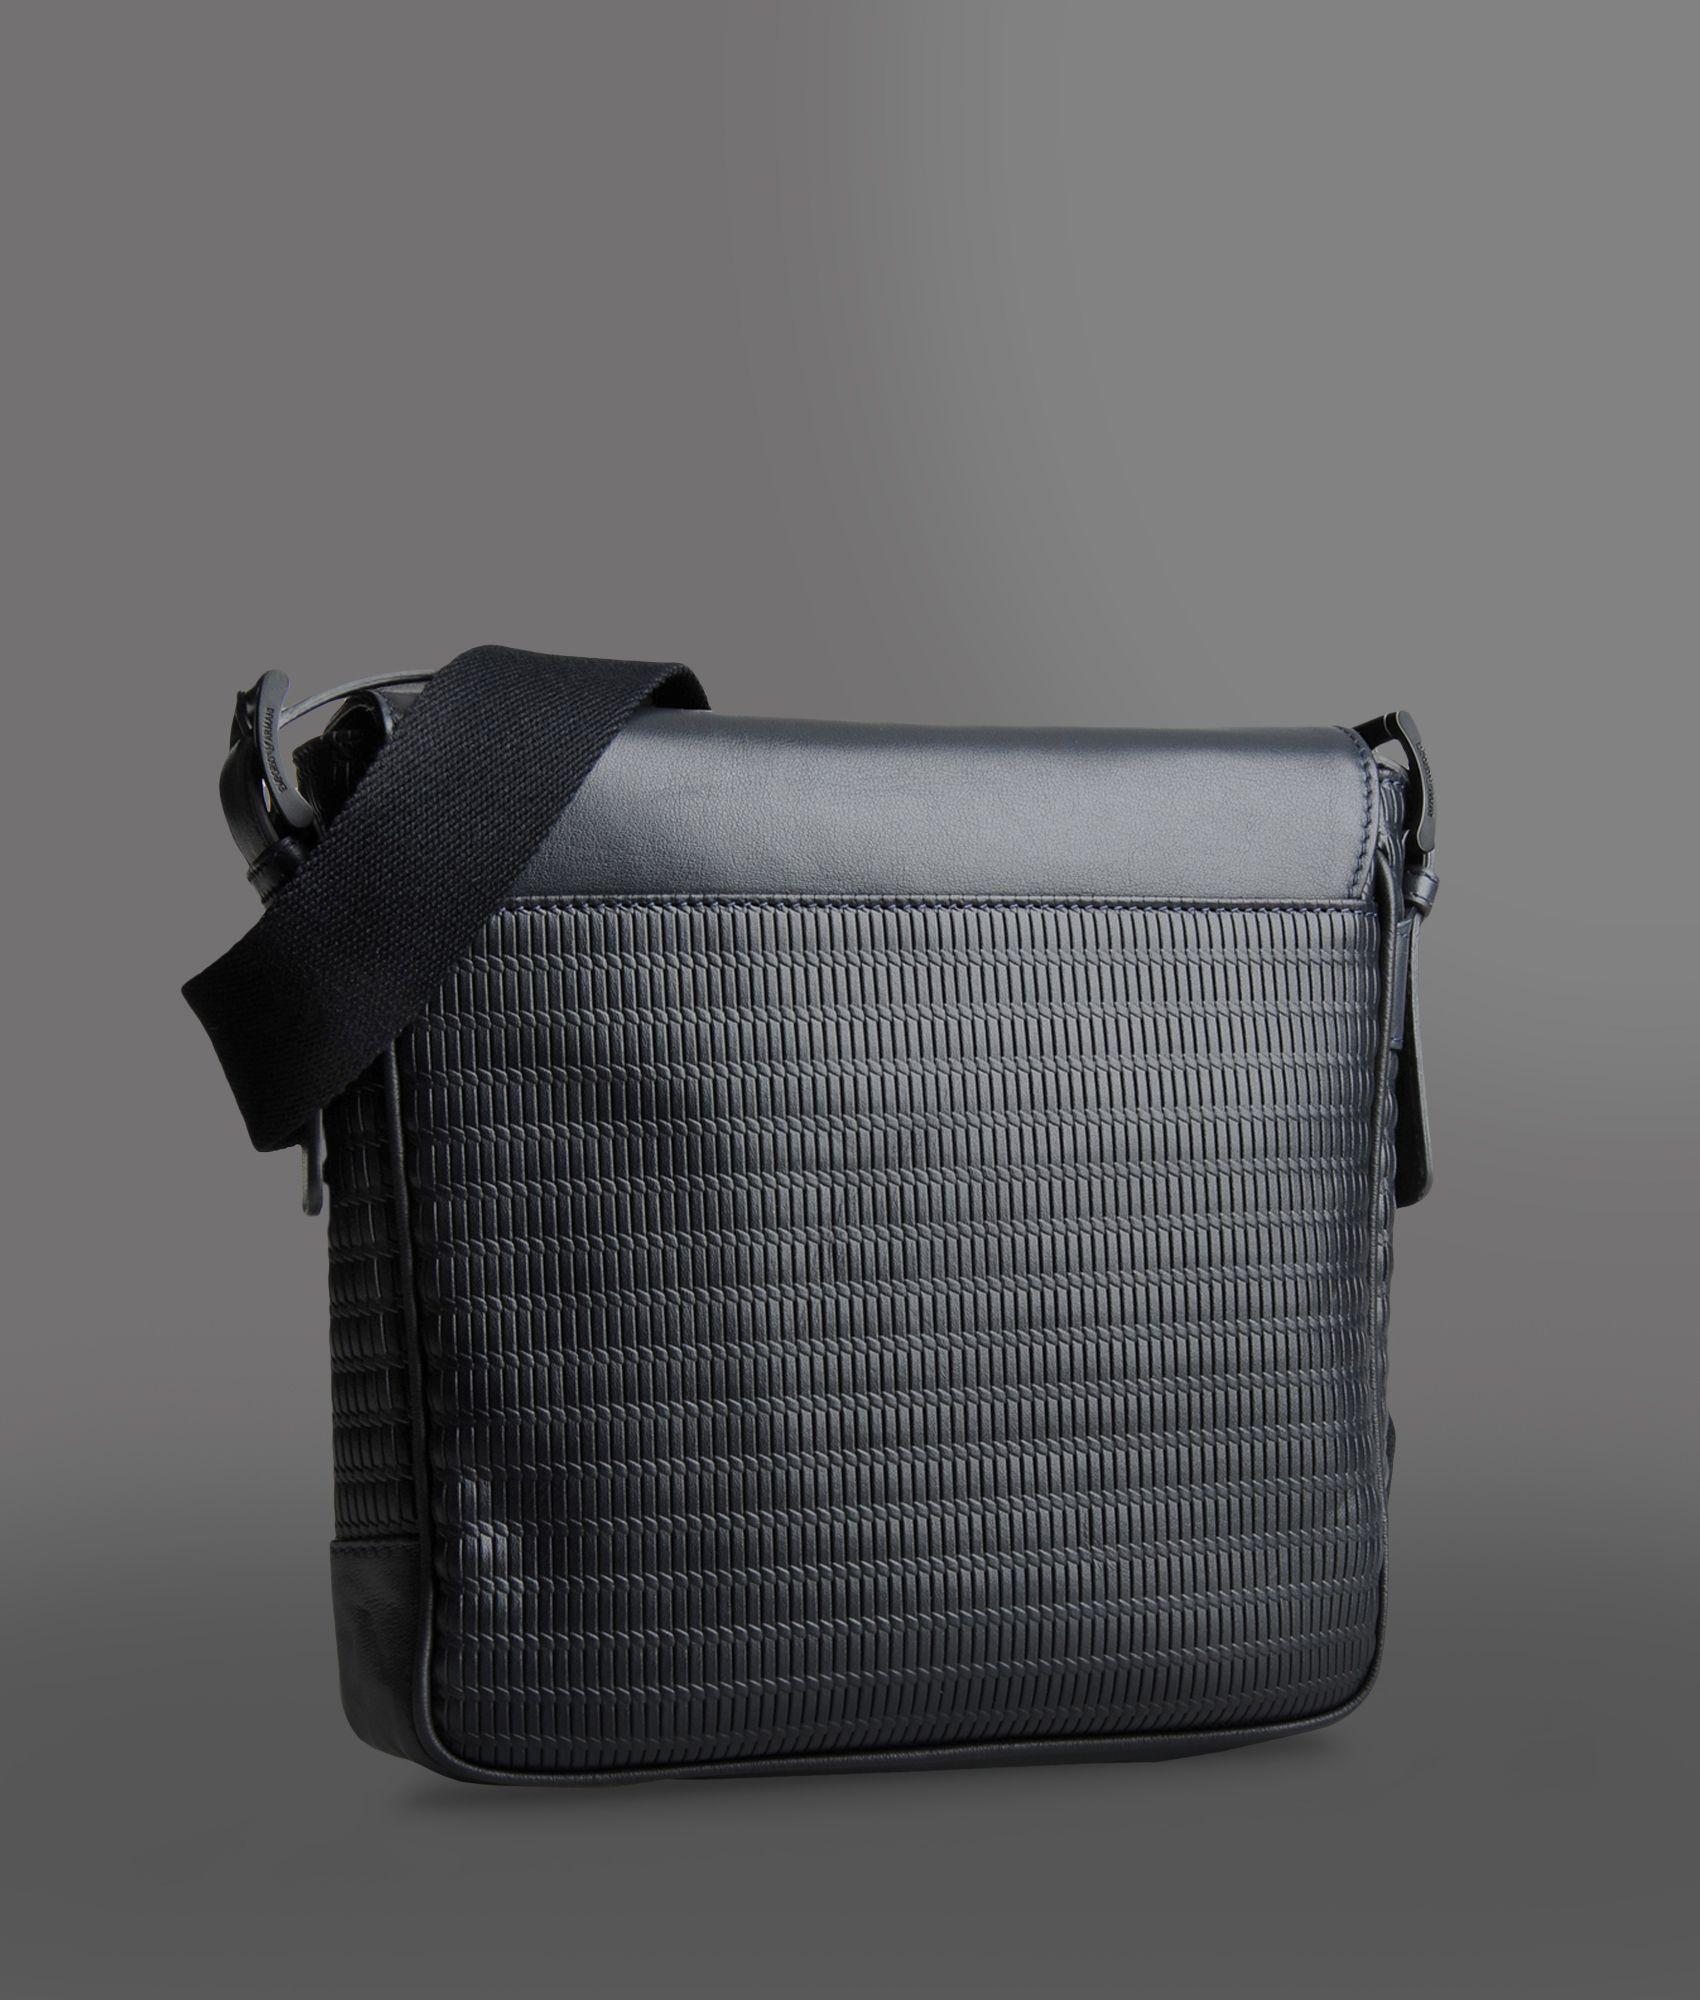 473be66e131d Lyst - Emporio Armani Messenger Bag in Black for Men